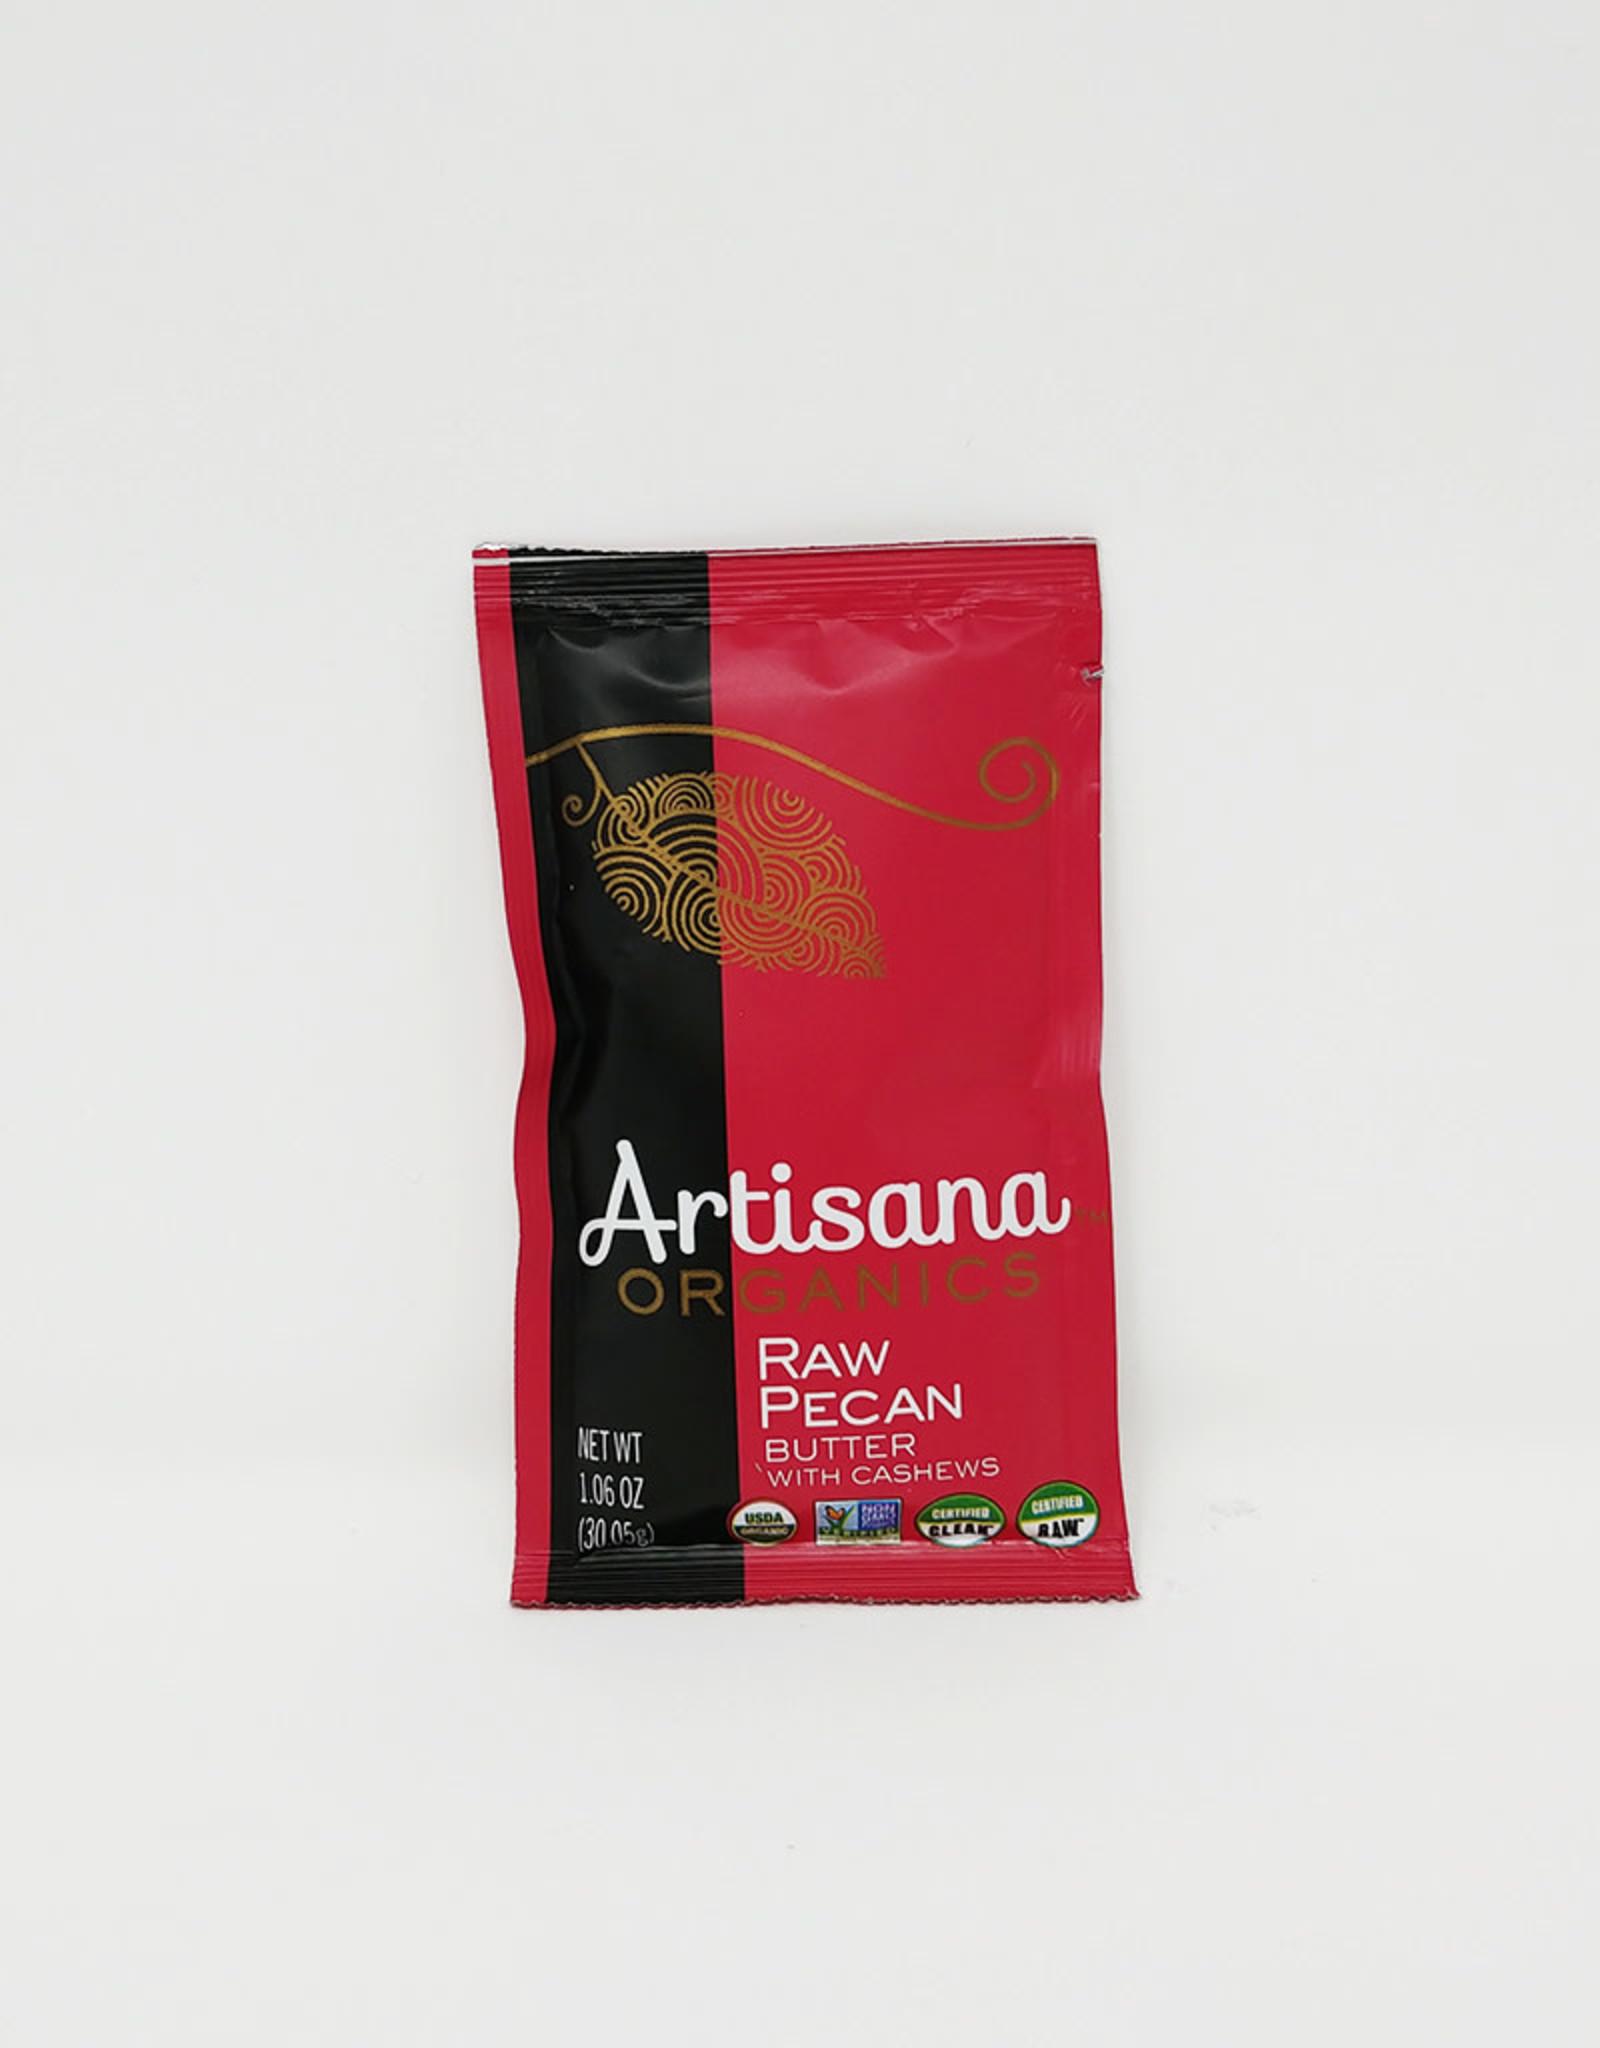 Artisana Artisana - Squeeze Pack, Raw Pecan Butter (30.05g)